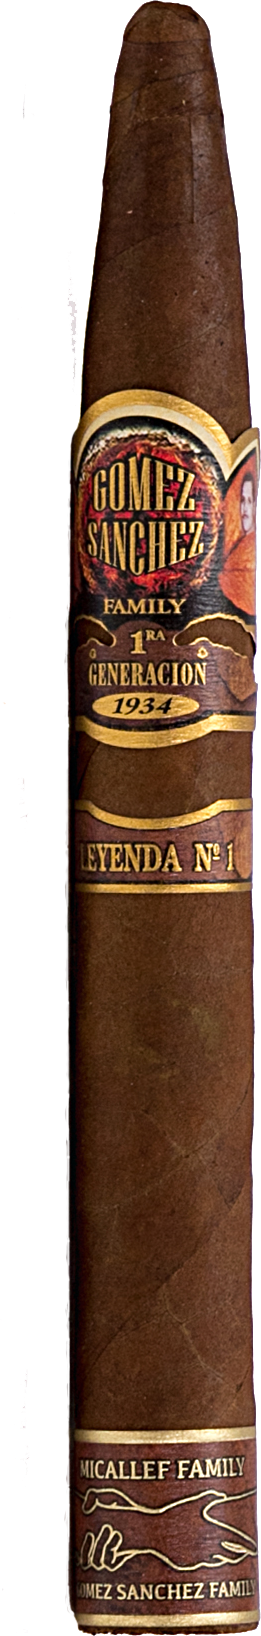 Leyenda+No.+1+Single.png